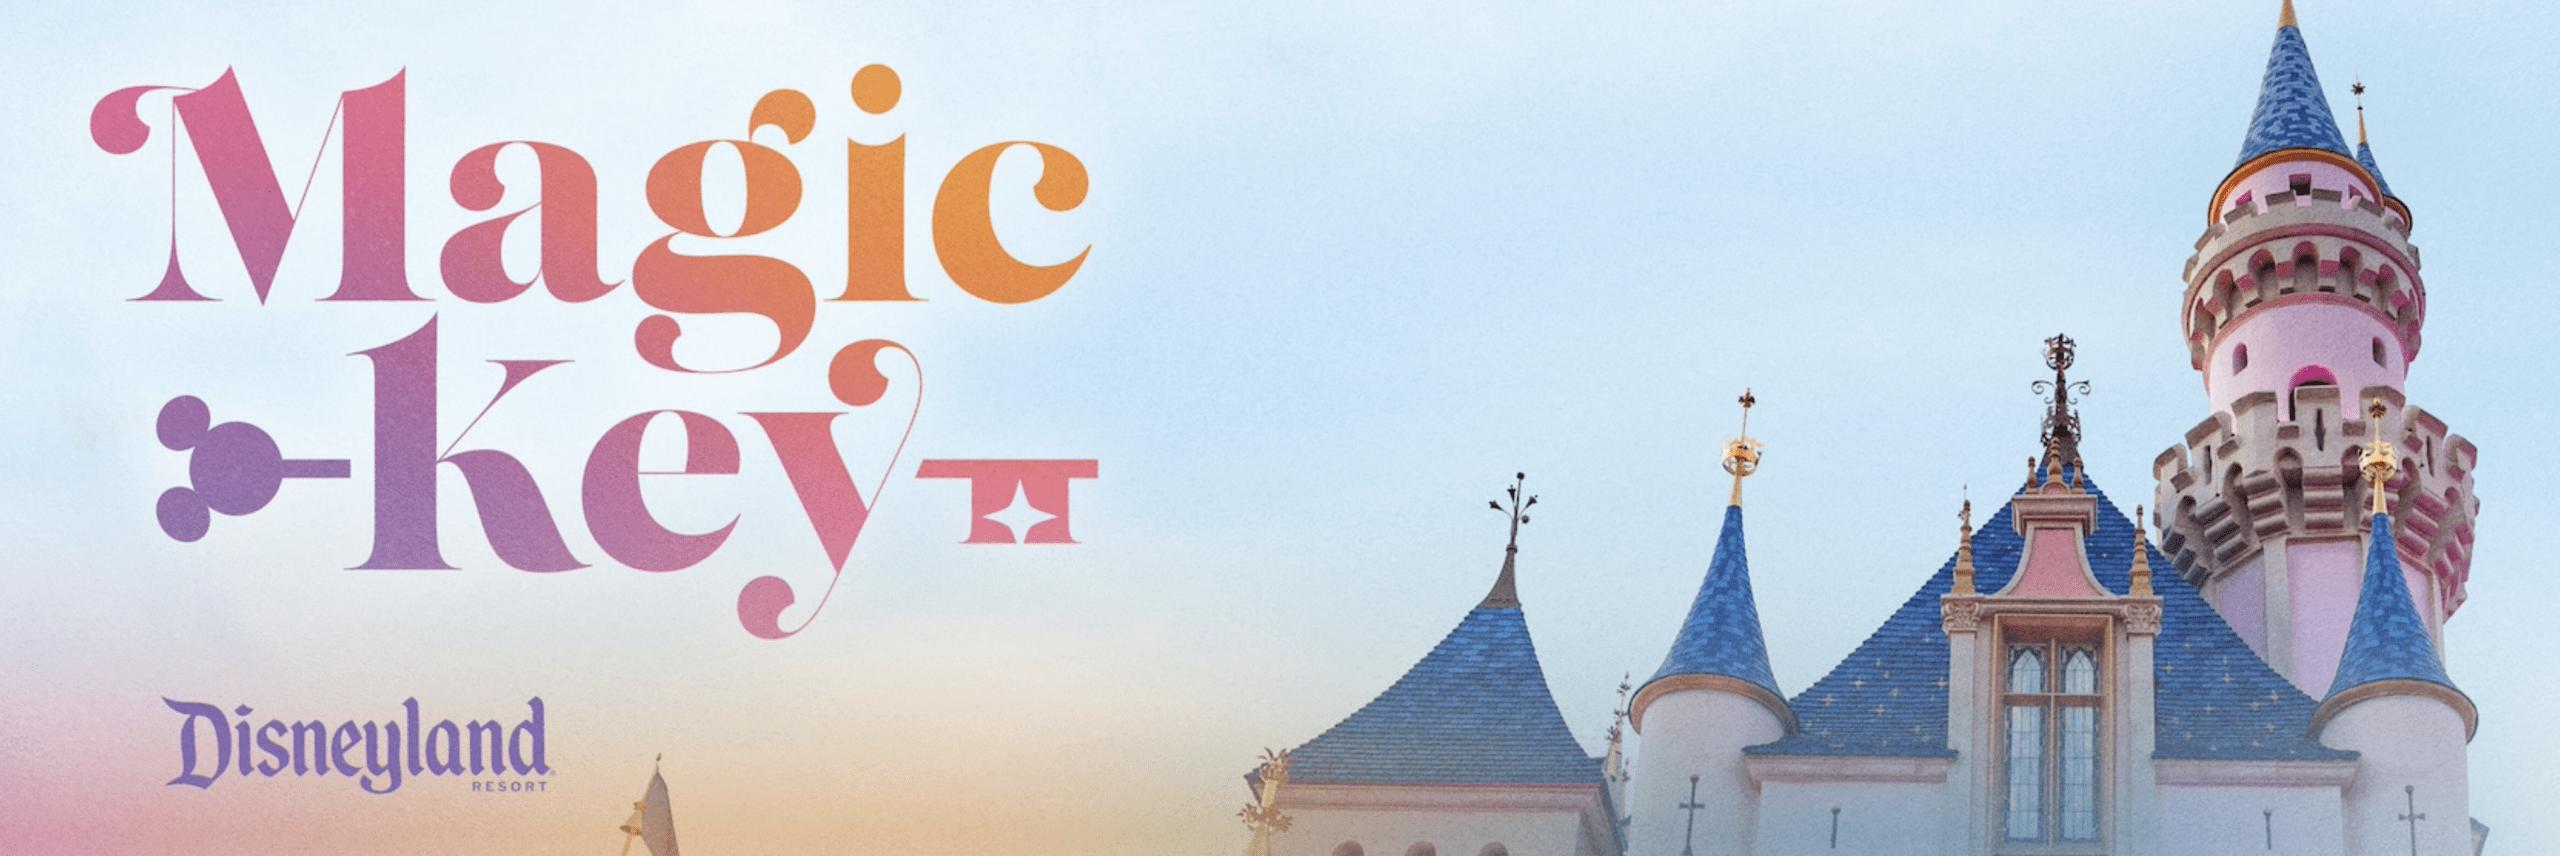 Disneyland Magic Key Annual Pass Program